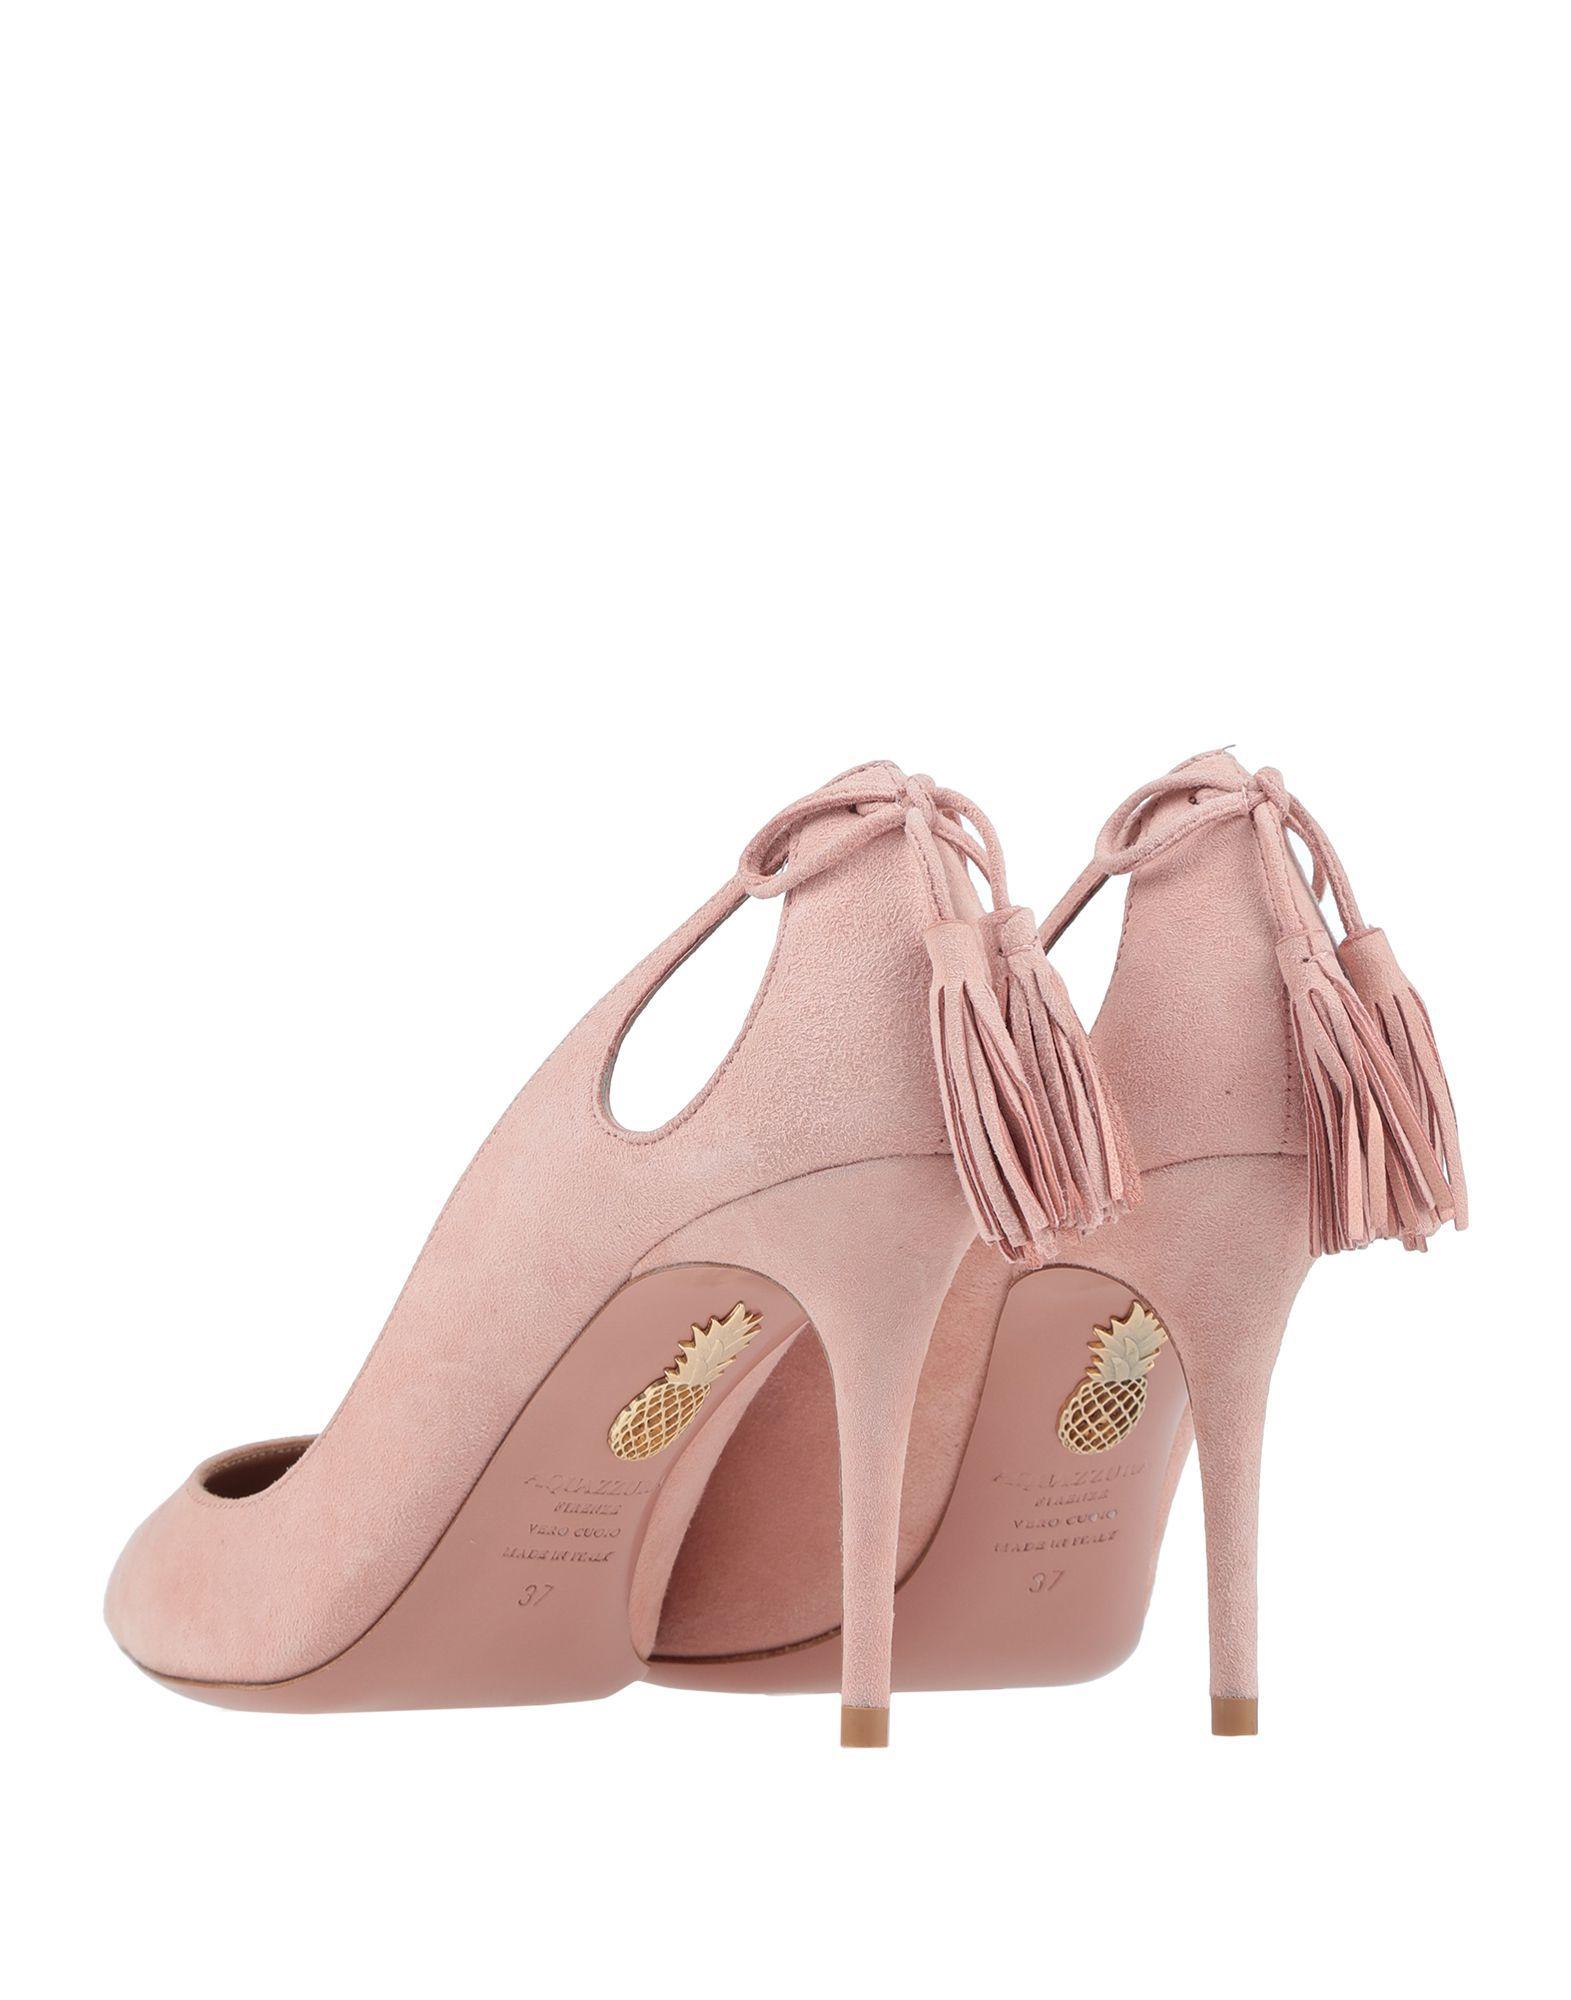 Aquazzura Pink Leather Heels